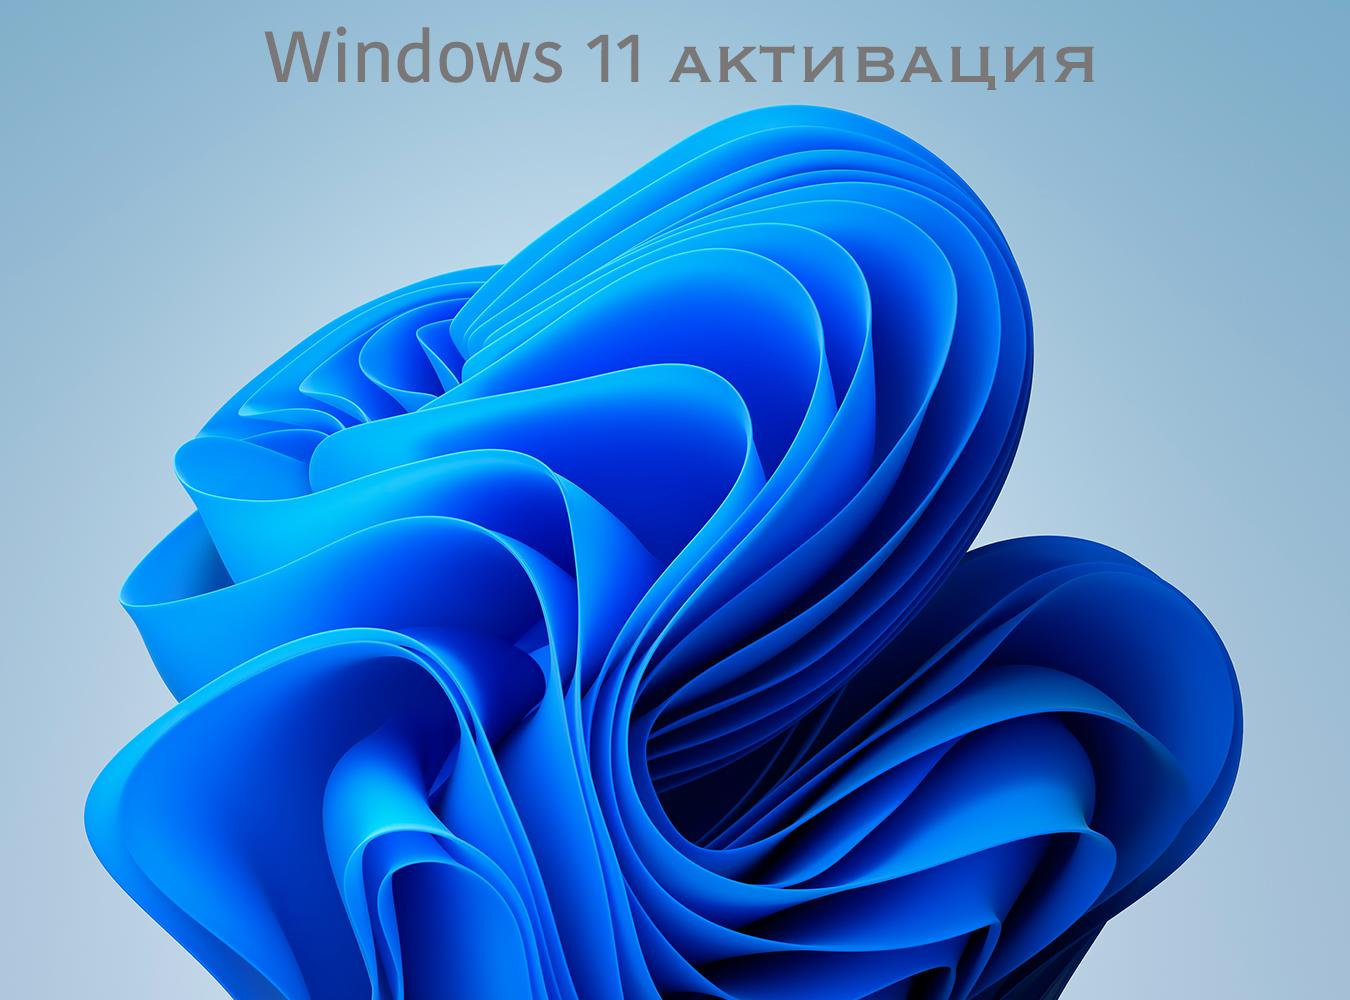 Активация Windows 11